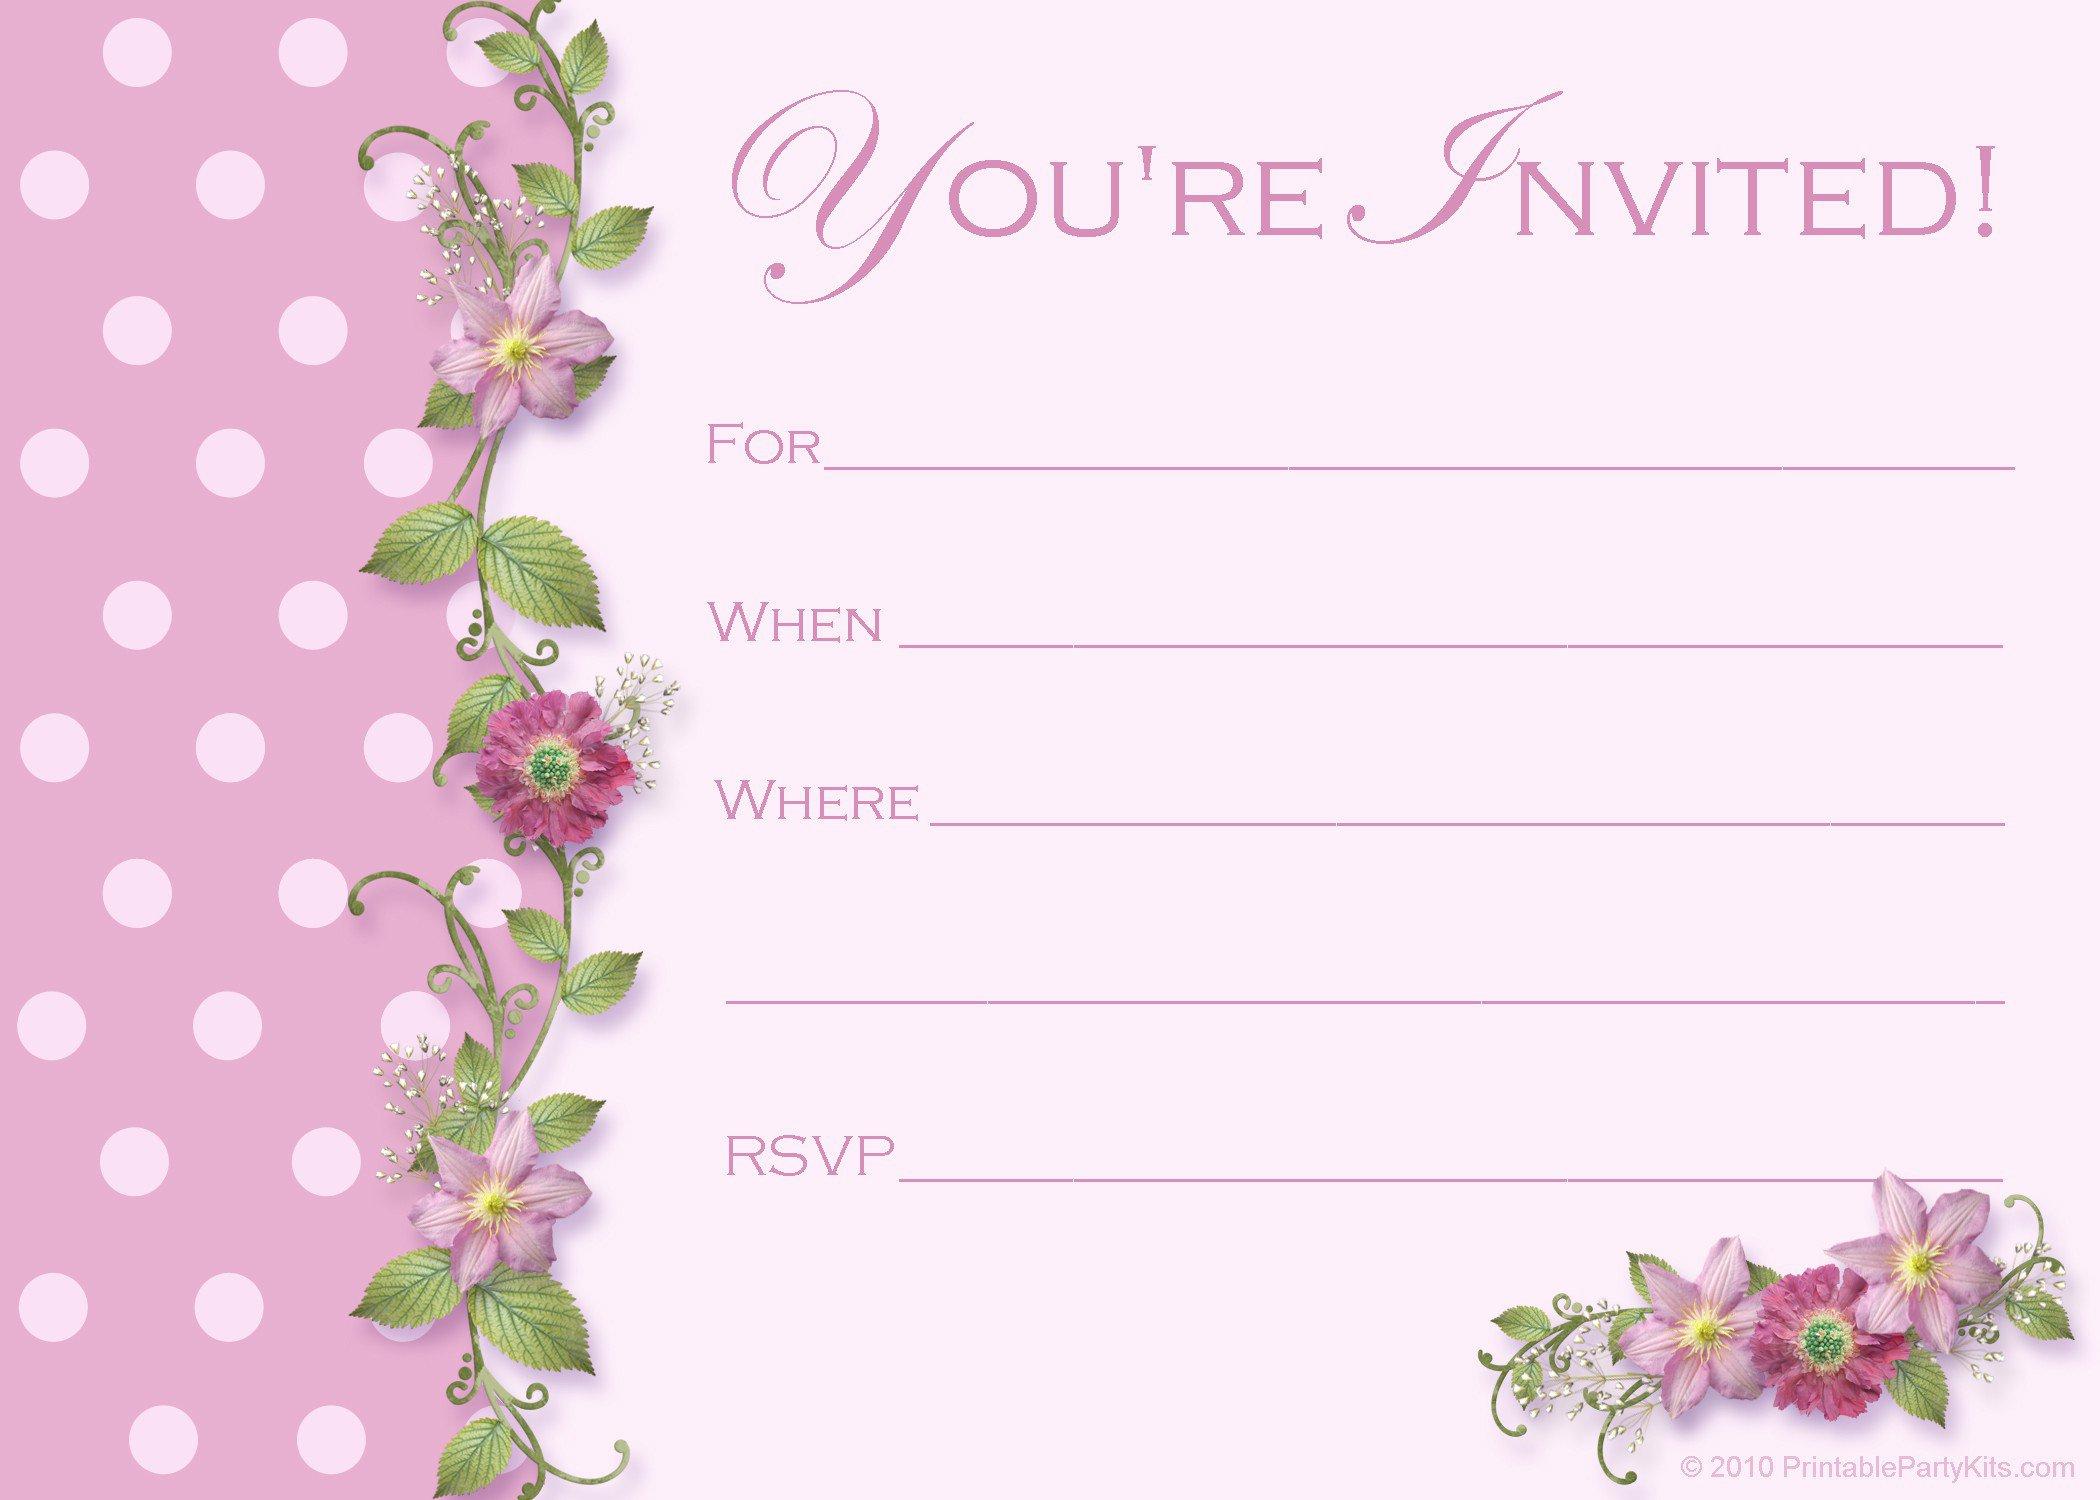 Printable Retirement Invitations